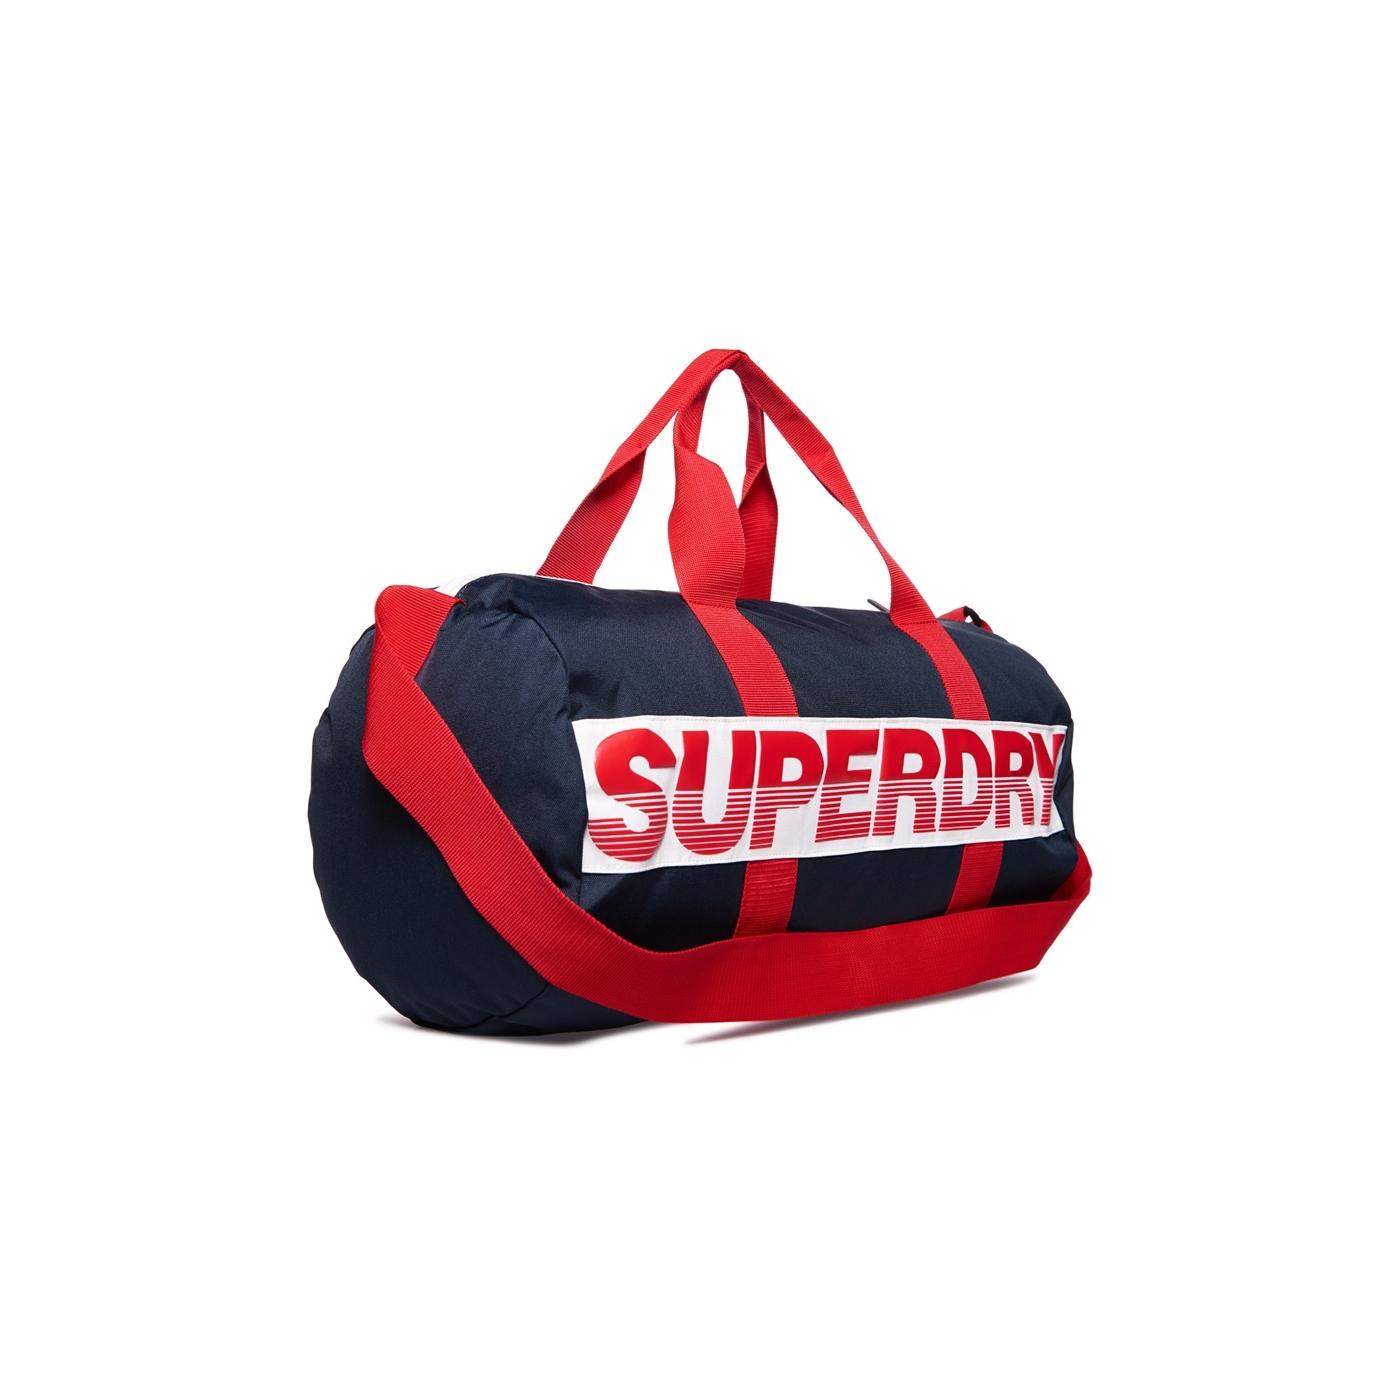 Superdry Sac International Barrel Navy De Sport BdeCxo